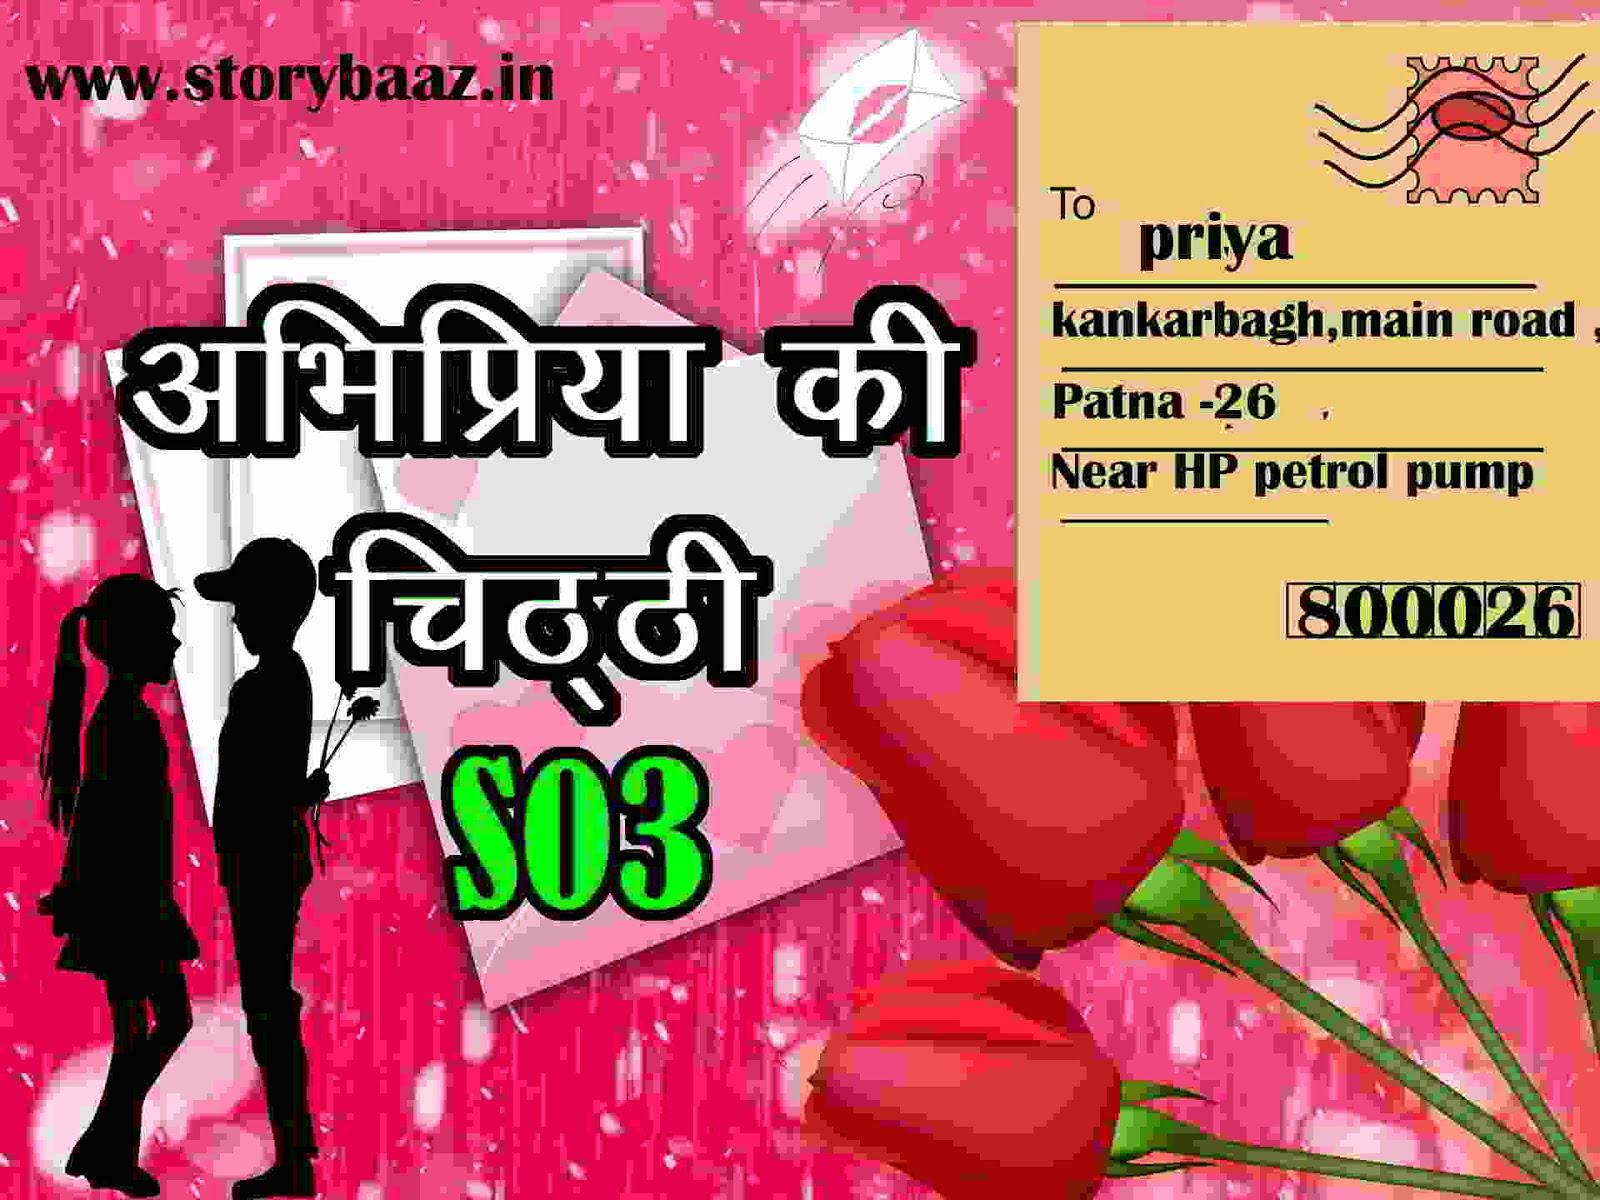 अभिप्रिया-की-चिठ्ठी-हिंदी-लव-लेटर-अभिप्रिया-की-चिठ्ठी-का-फोटो-abhipriya-ki-chiththi-photo-avinash-akela-love-letter-storybaaz-love-letter-in-hindi-images